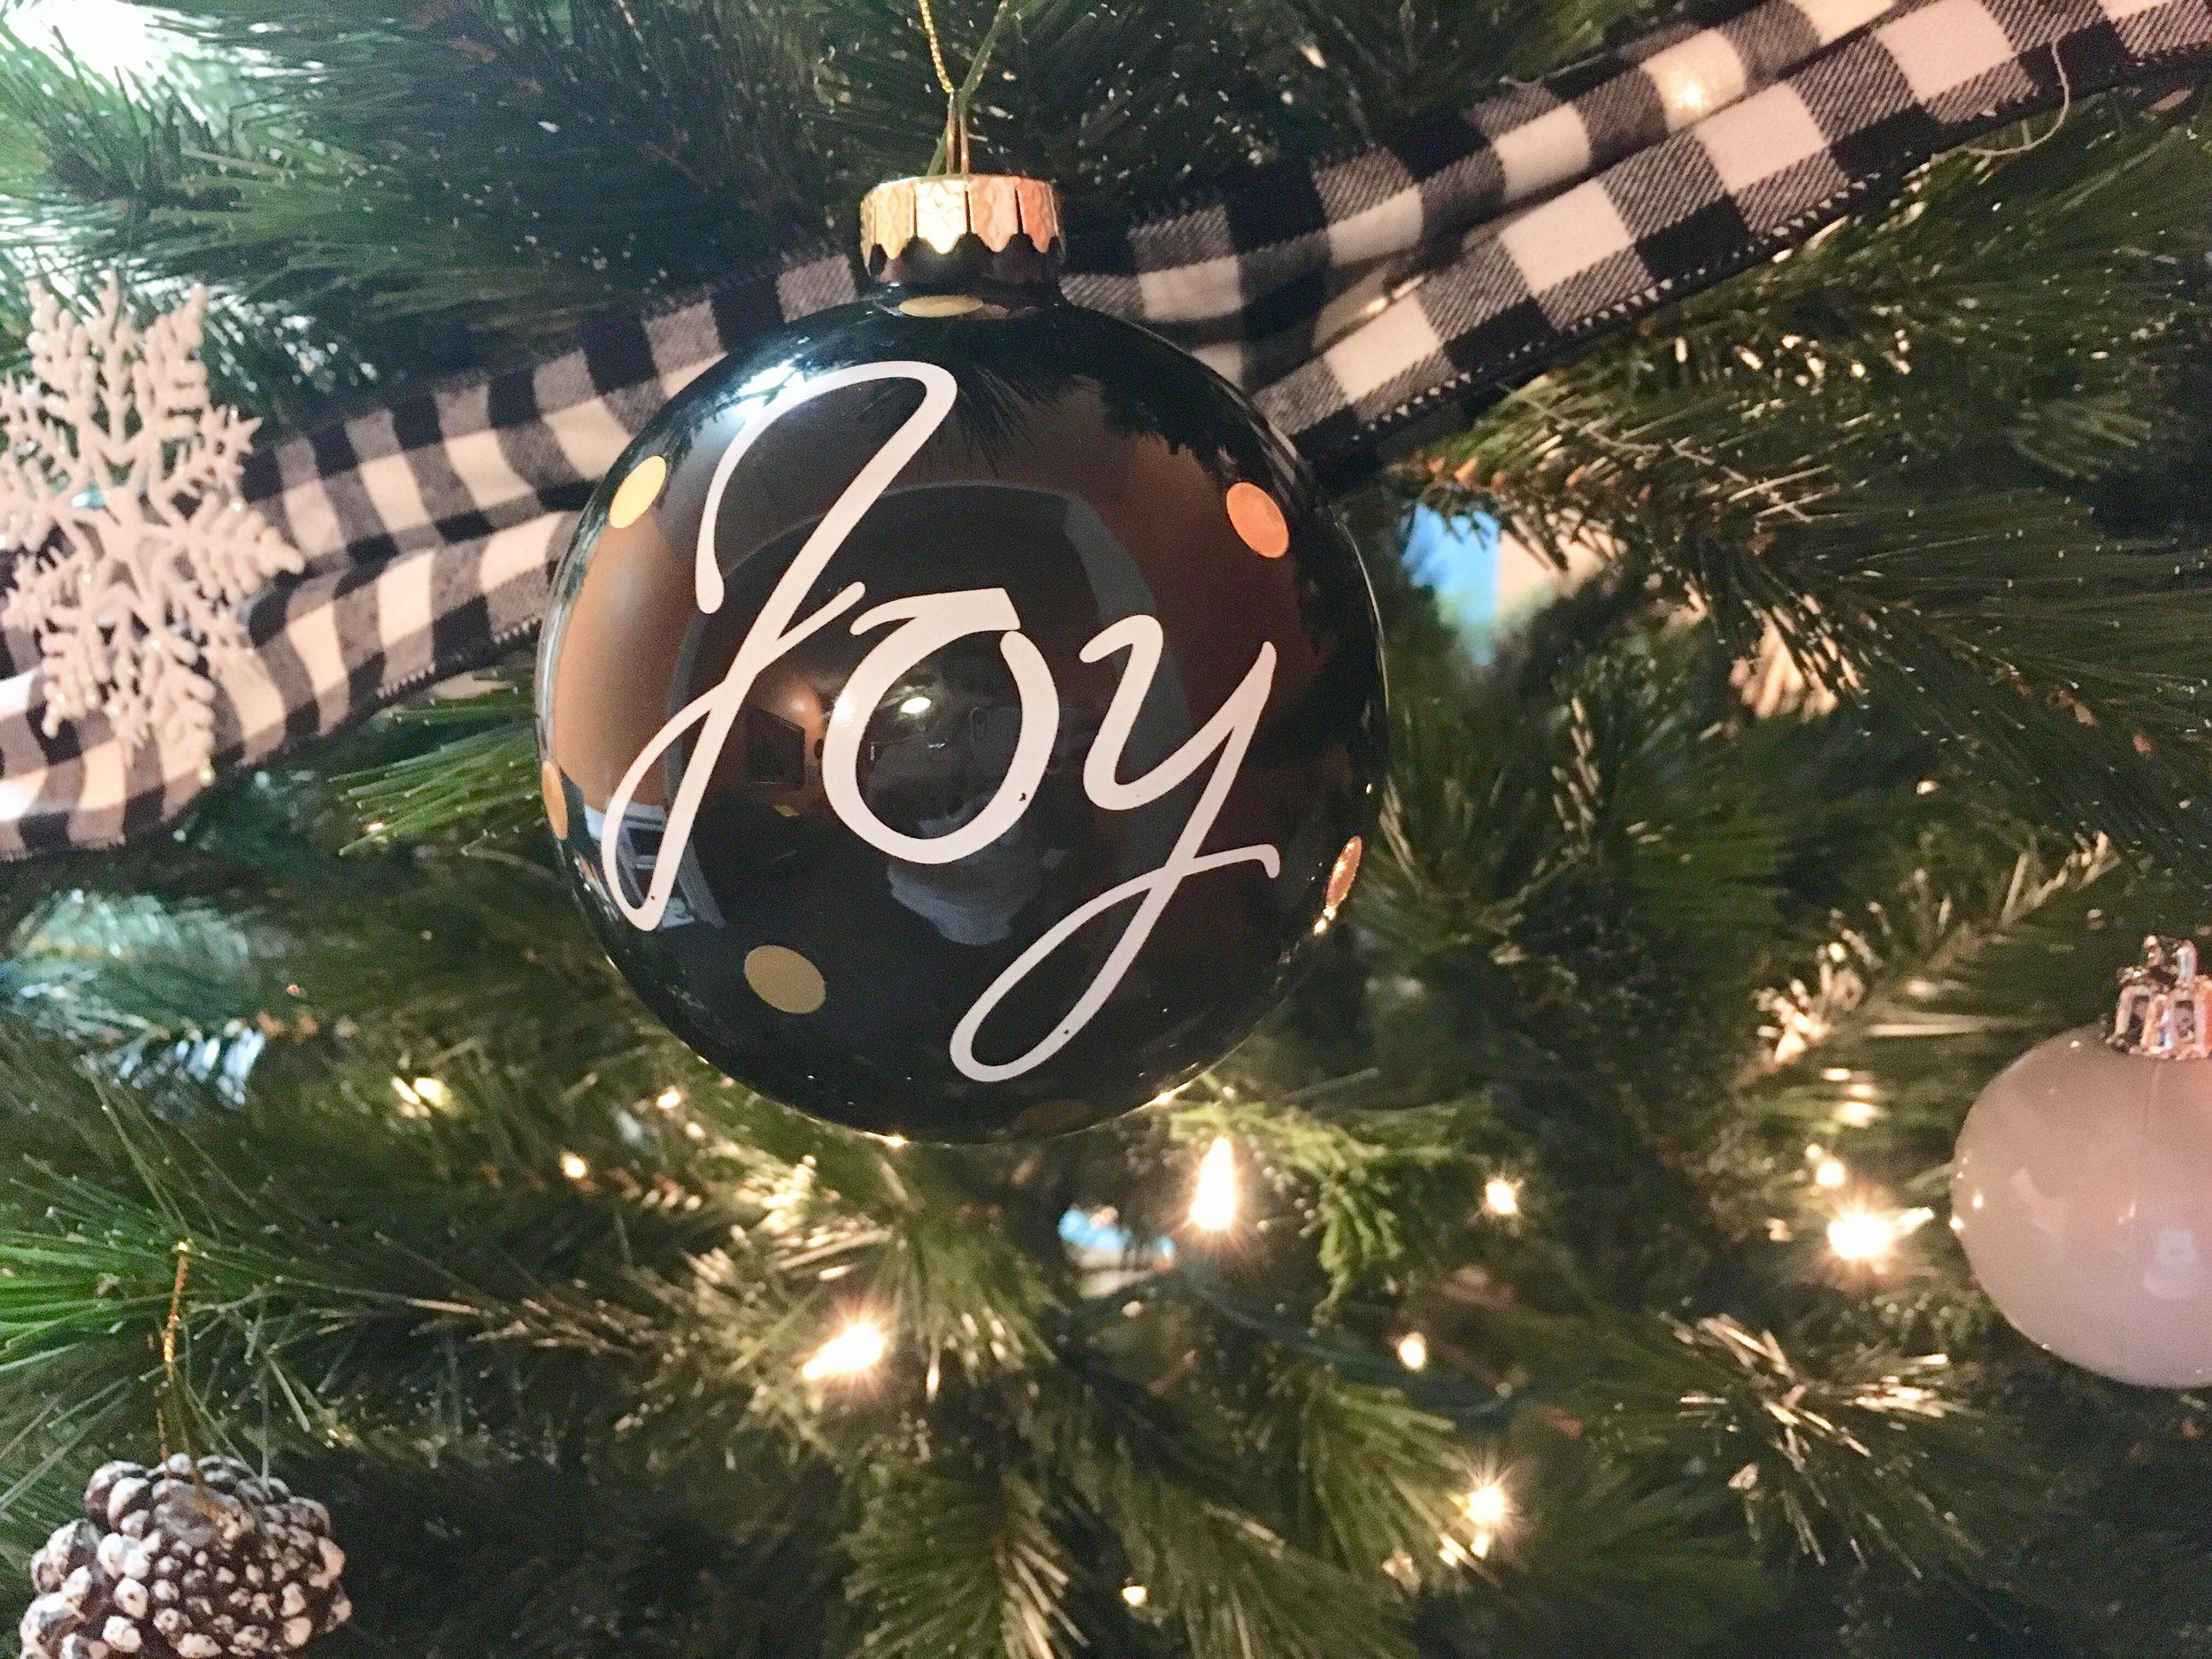 An image to express the spirit of Christmas... one of my very favorite ornaments on my music stuido's Christmas tree! Joy joy joy joy...